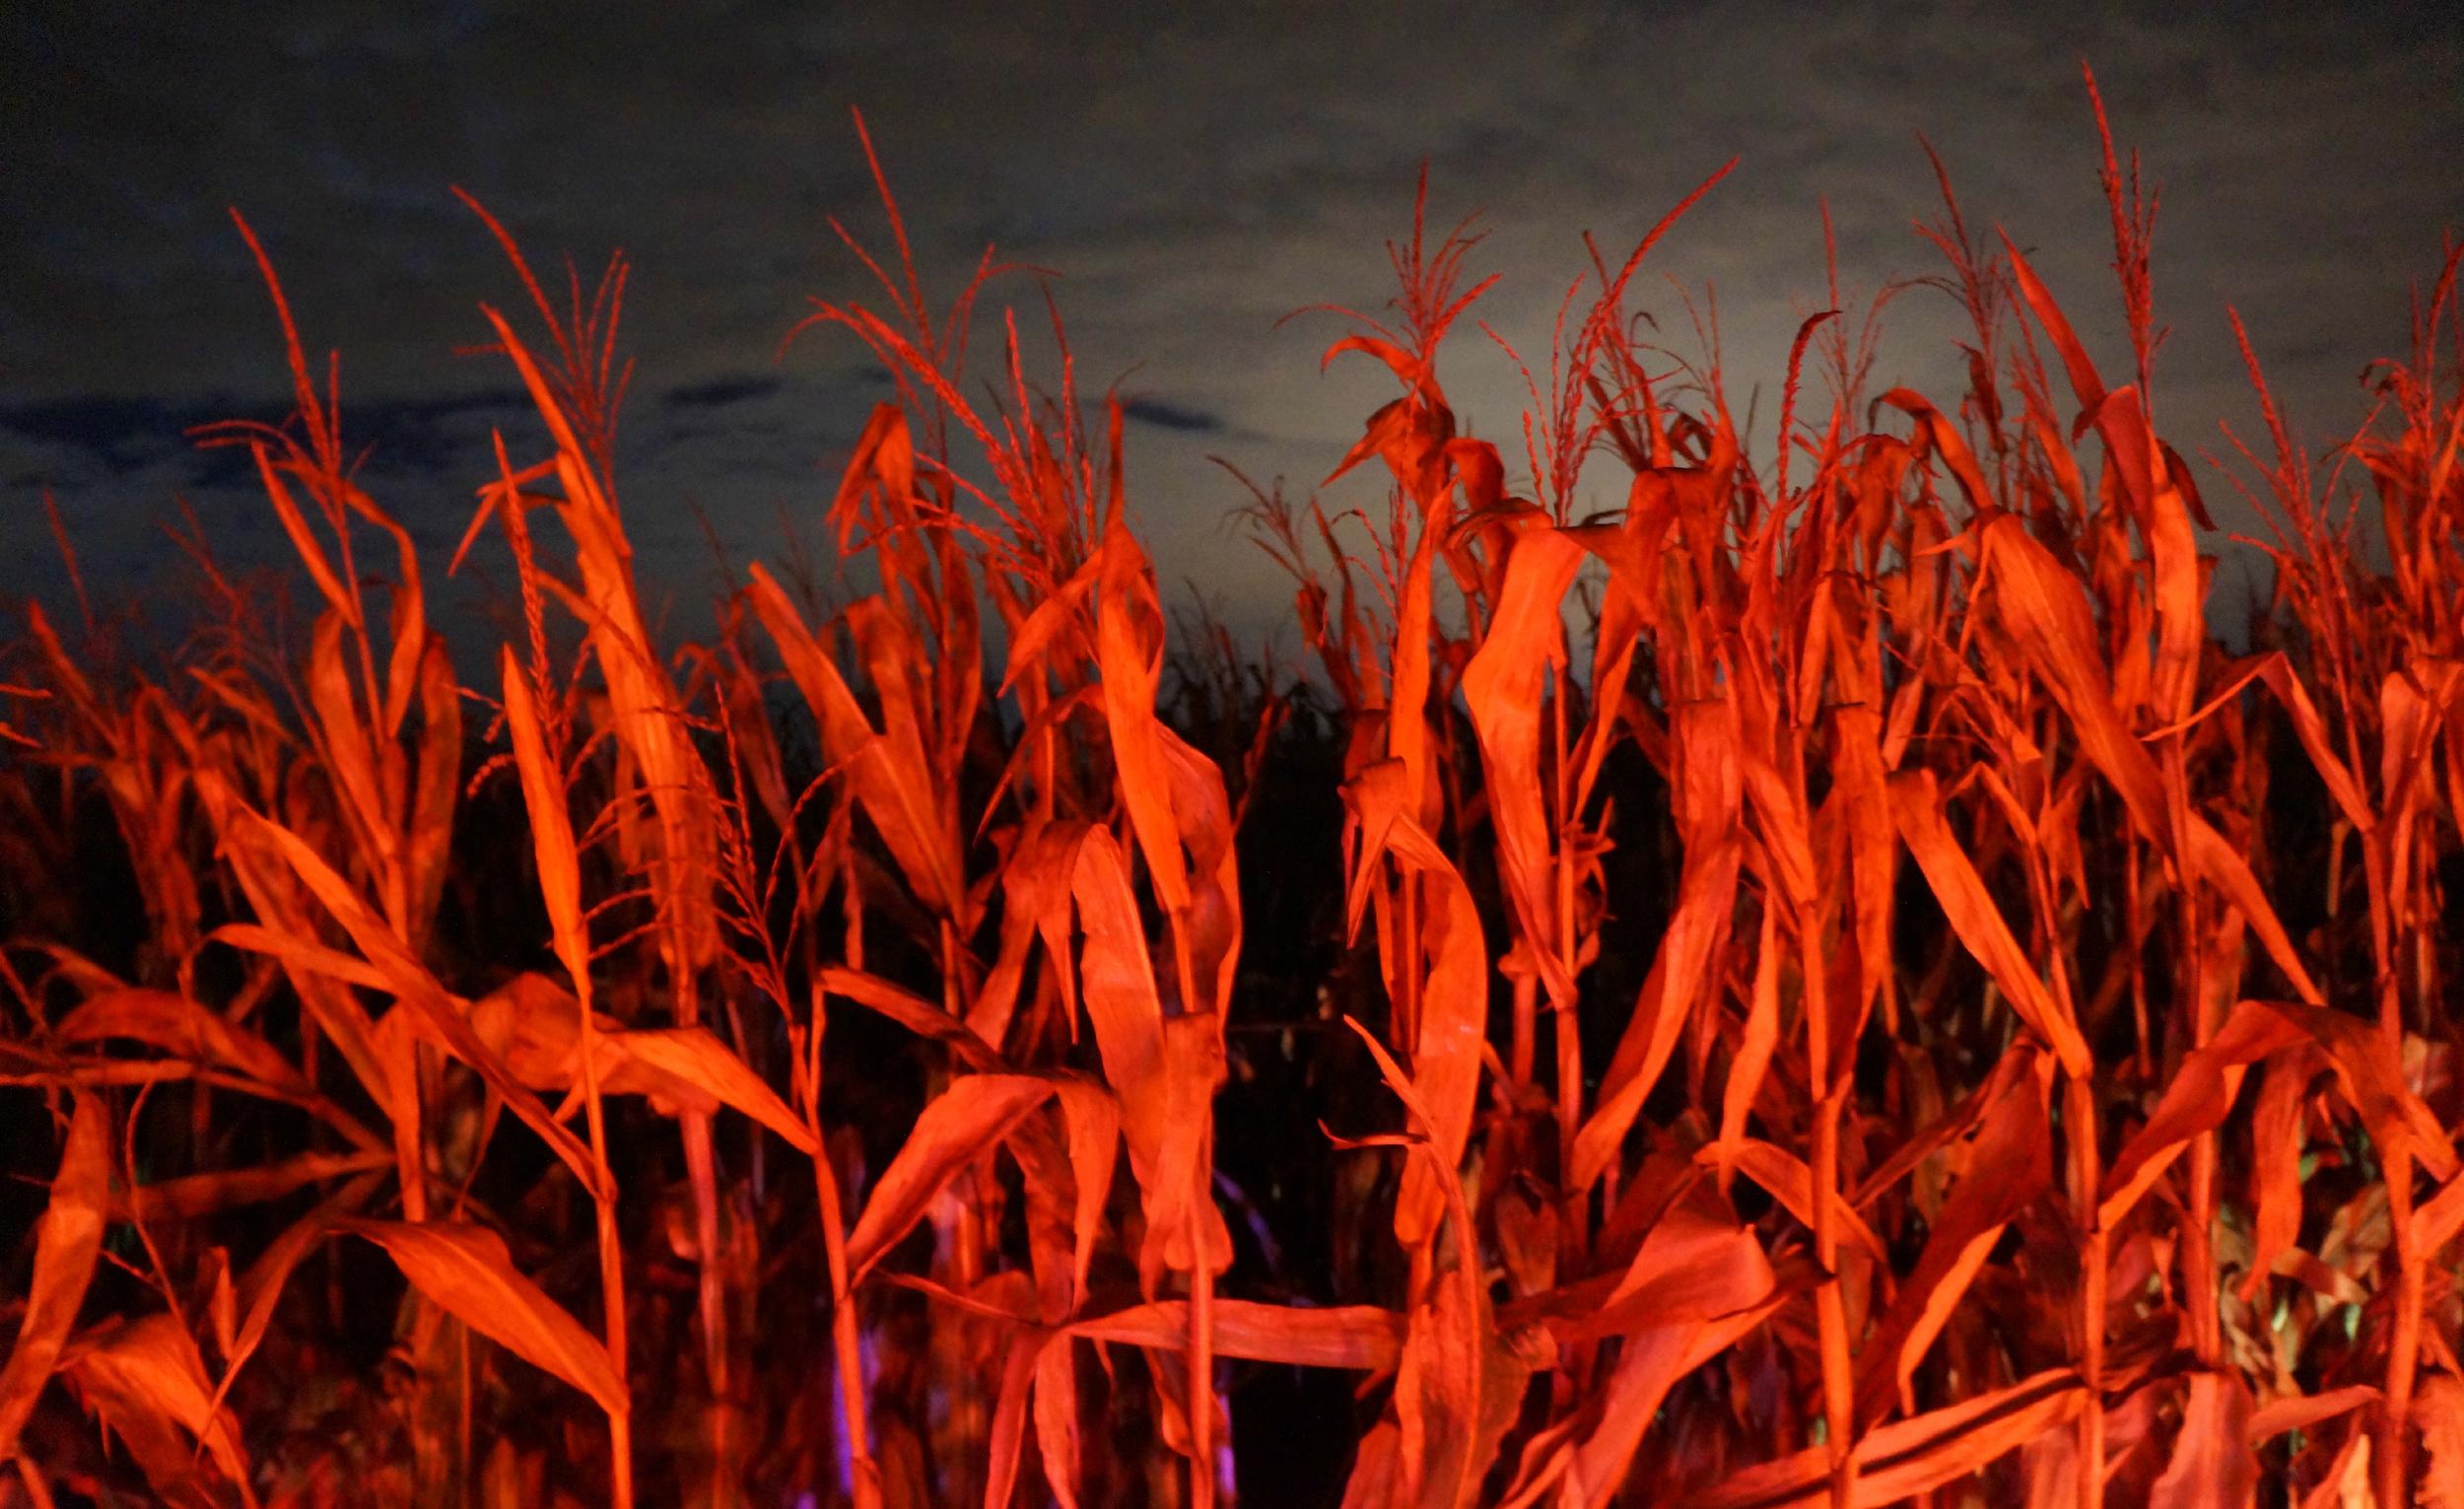 Orange Corn Stalks.jpg